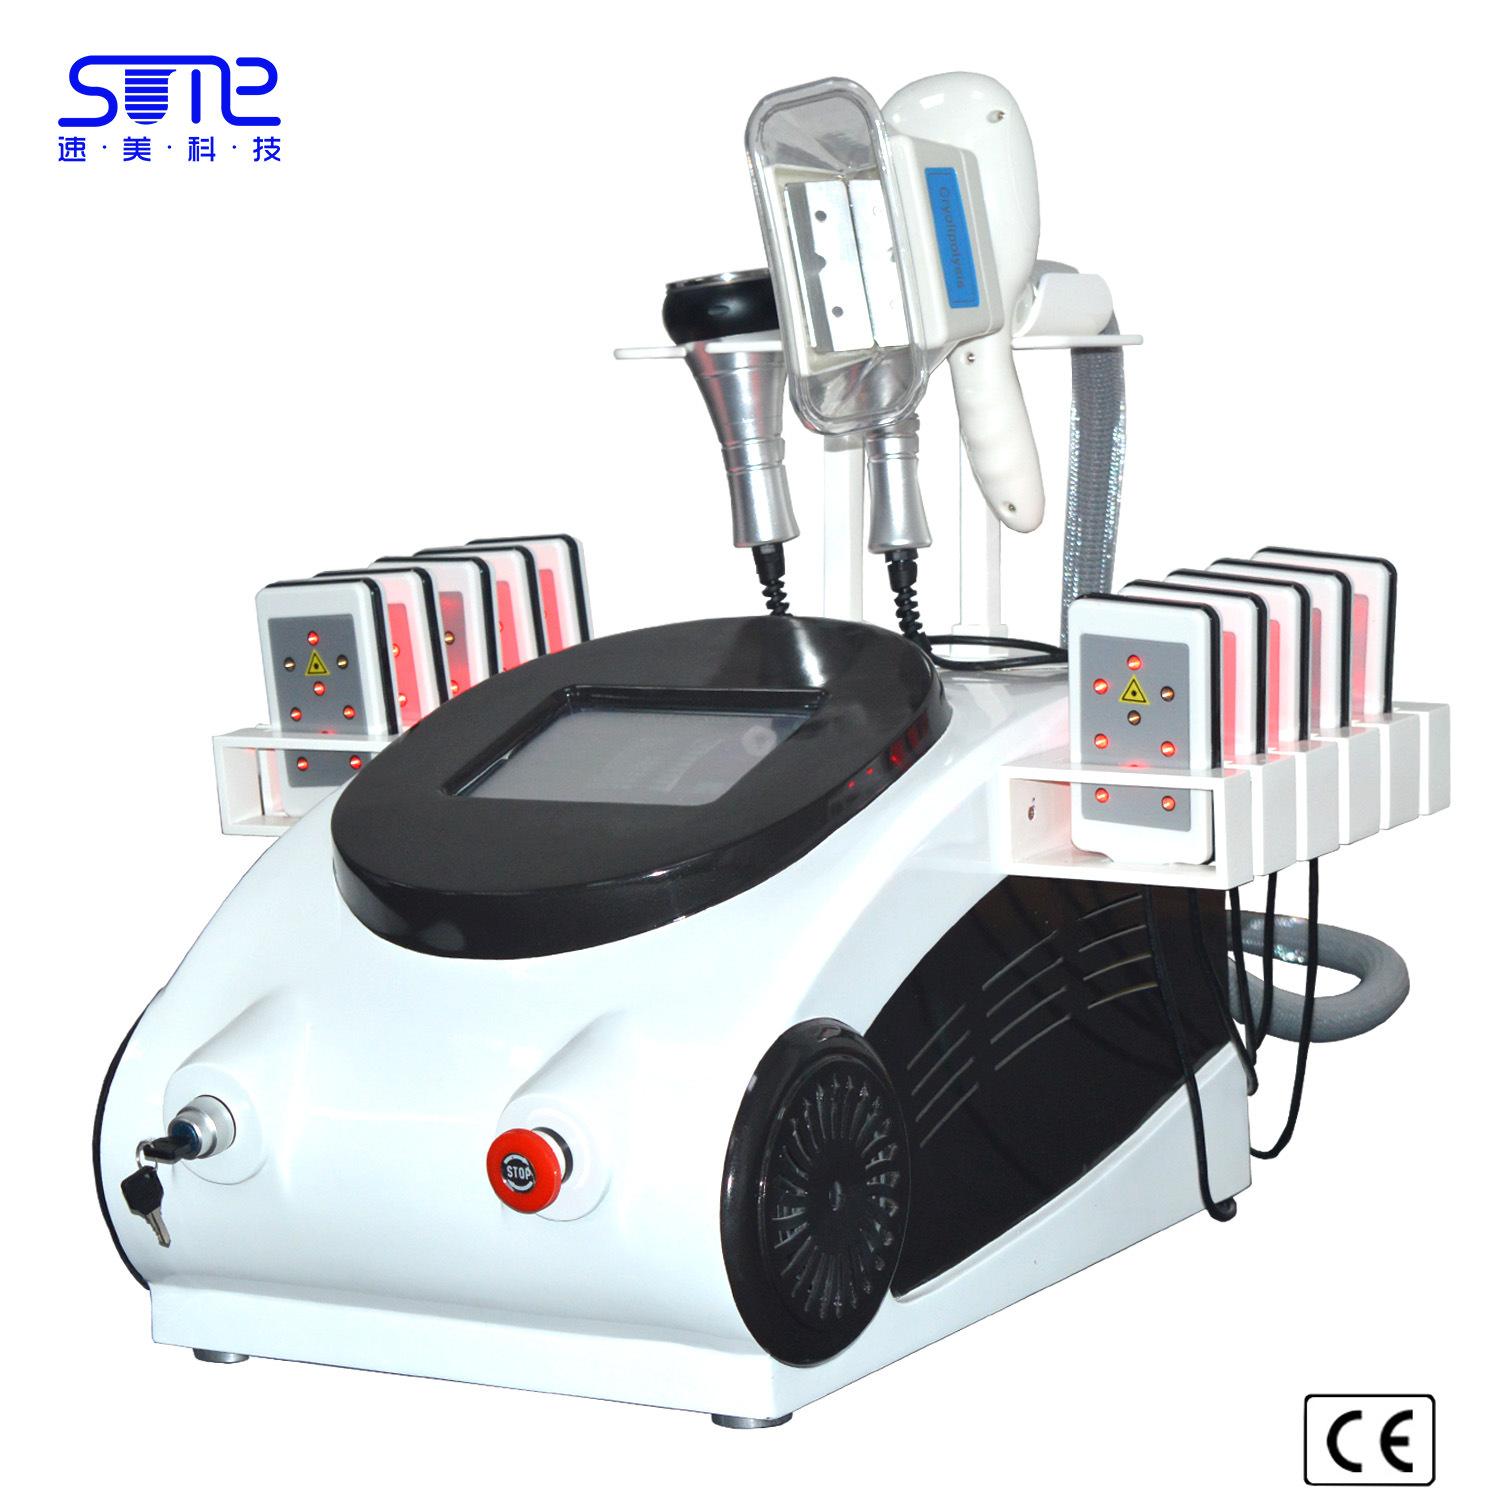 Lipo Laser Body Slimming Zeltiq Cryo Cryolipolysis Machine